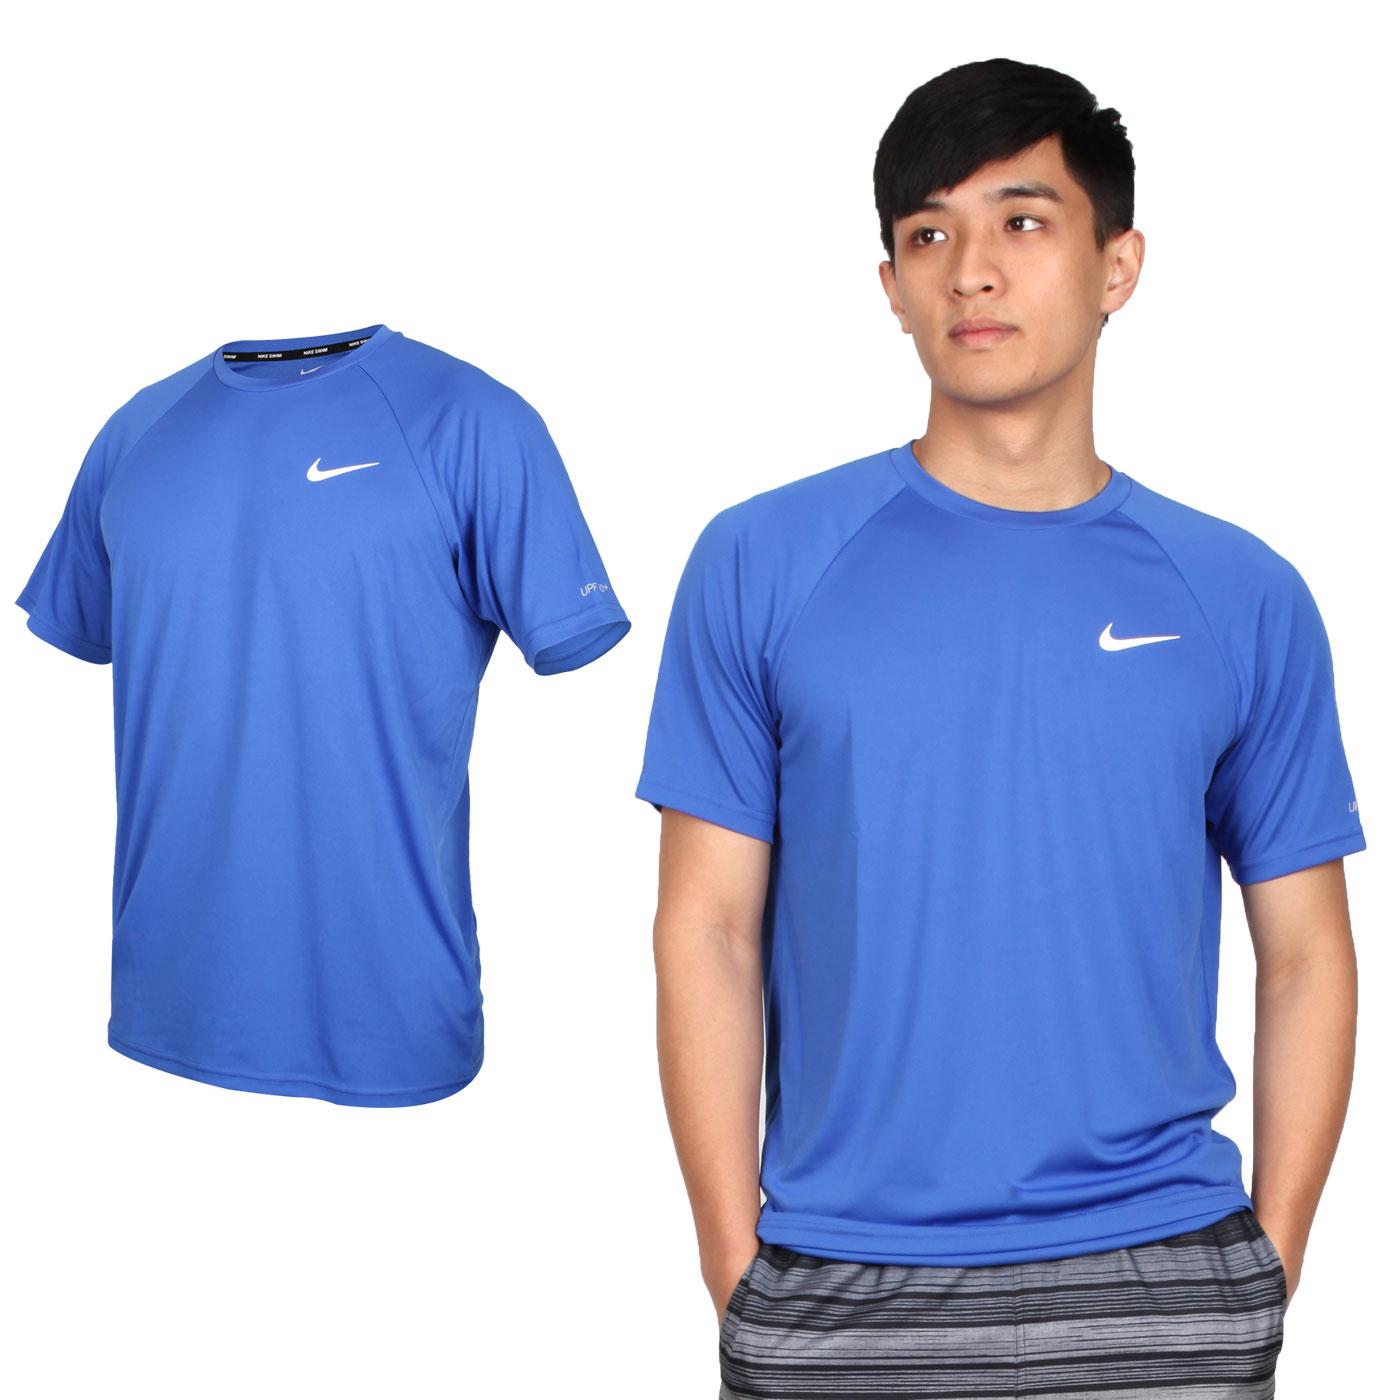 NIKE SWIM 男款短袖防曬T恤 NESSA586-494 - 藍白